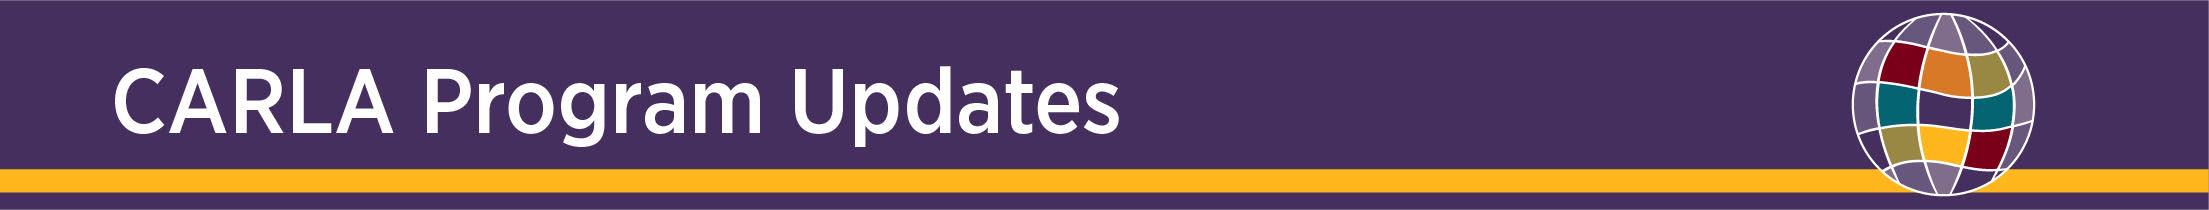 Program Updates - section header